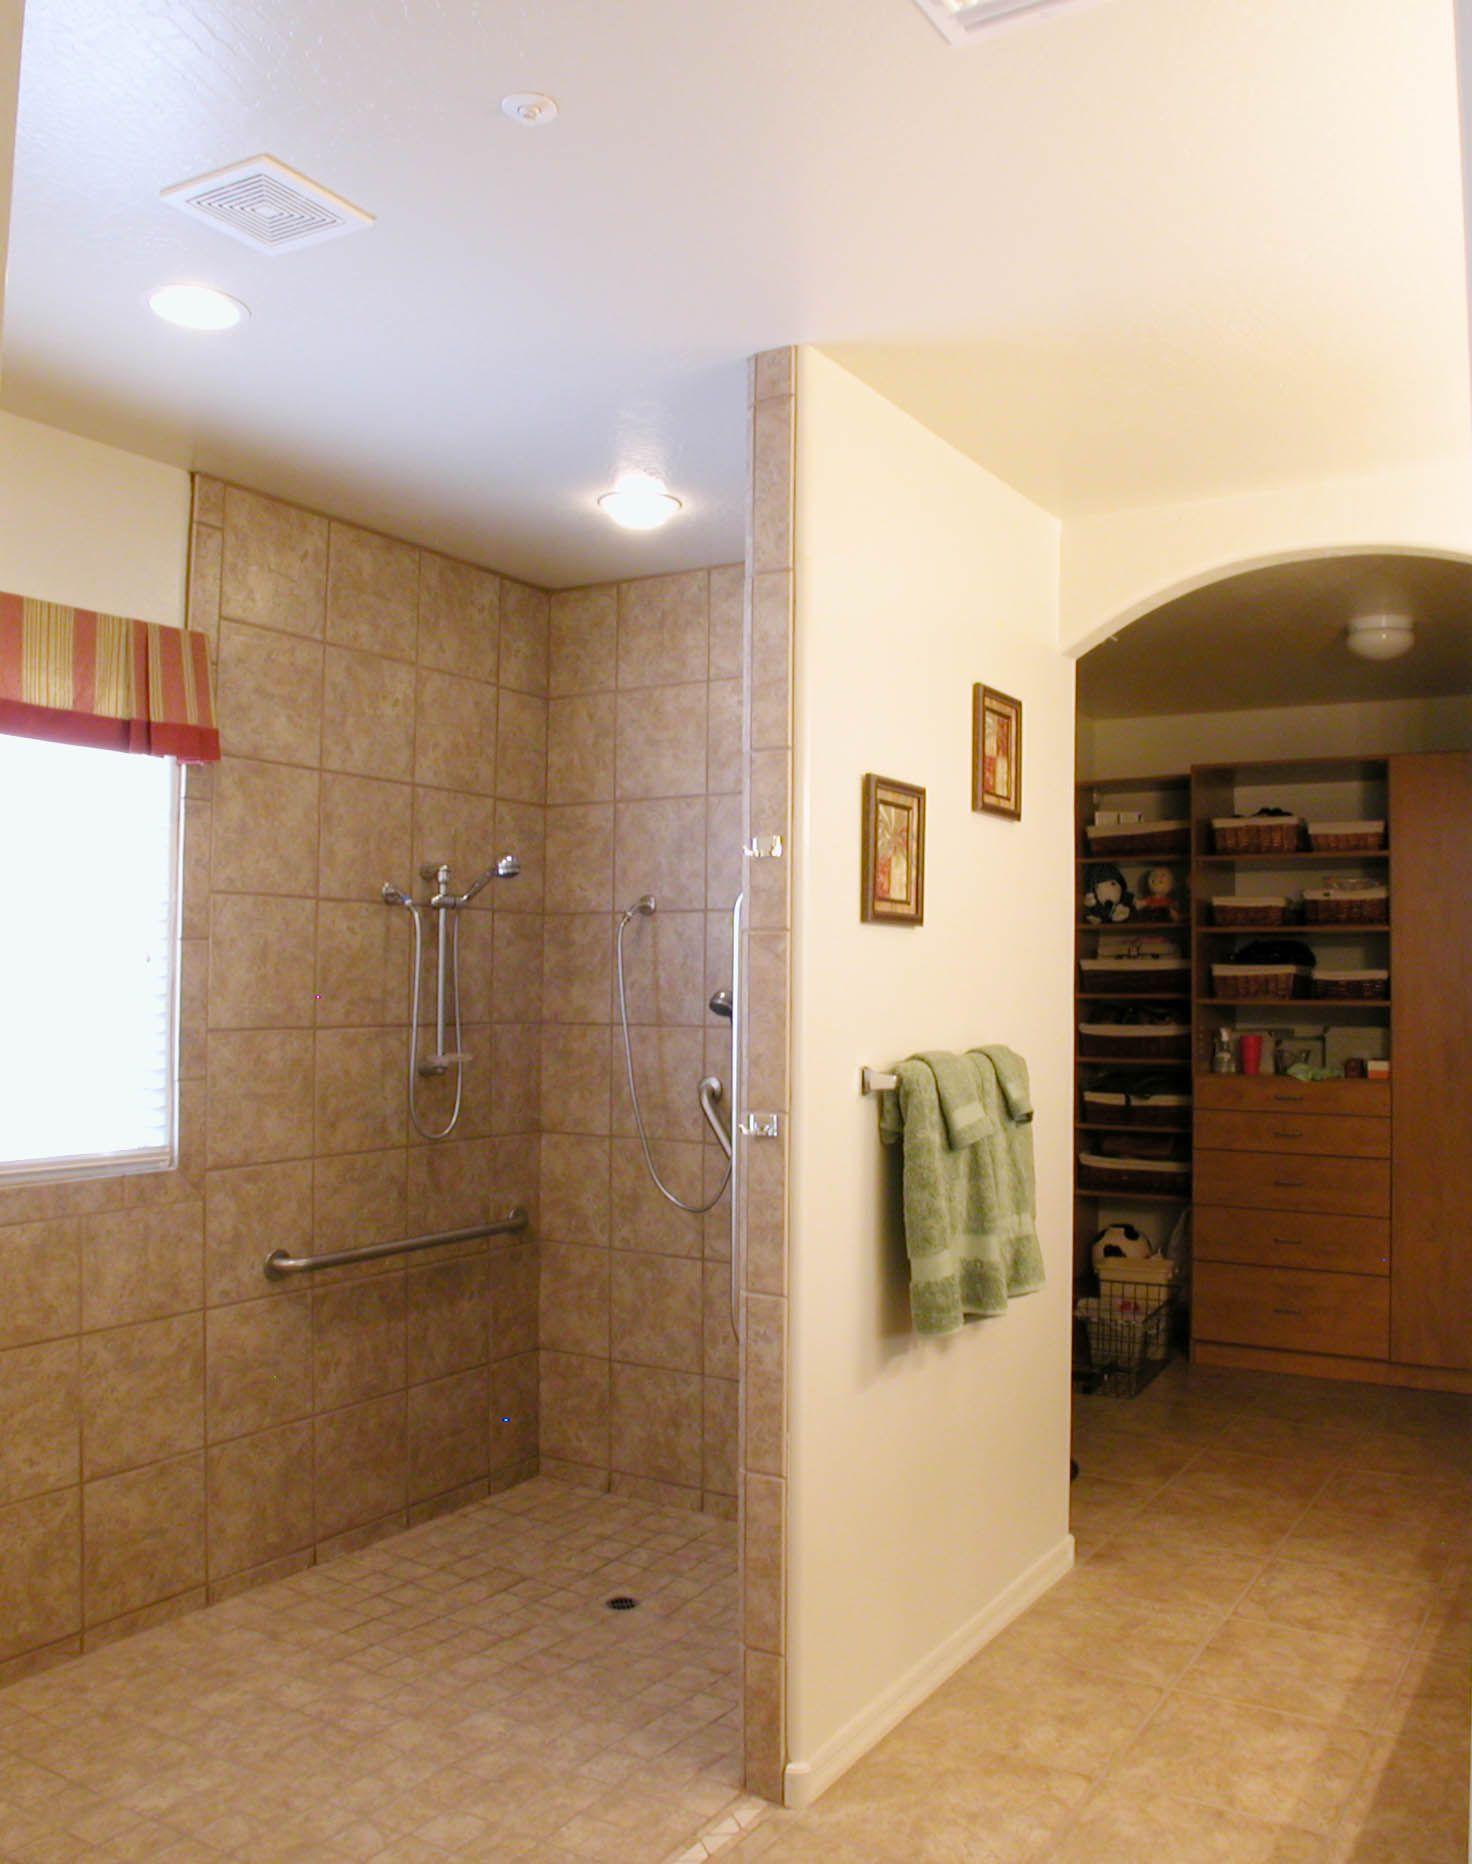 nancyhugo designer Bathroom Renos Handicap Bathroom Bathroom Renovations Shower No